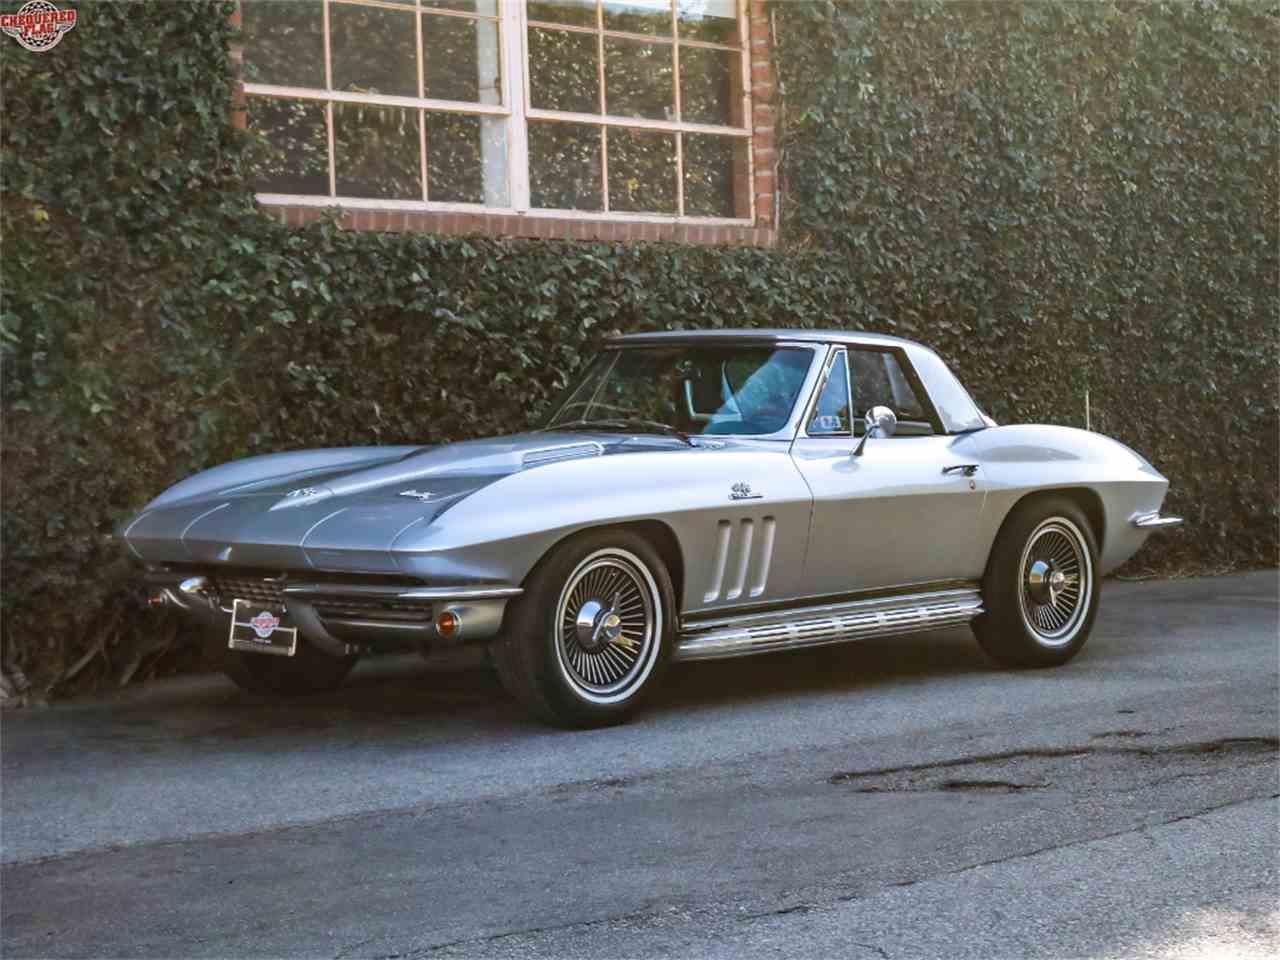 1966 Chevrolet Corvette for Sale | ClassicCars.com | CC-1053541